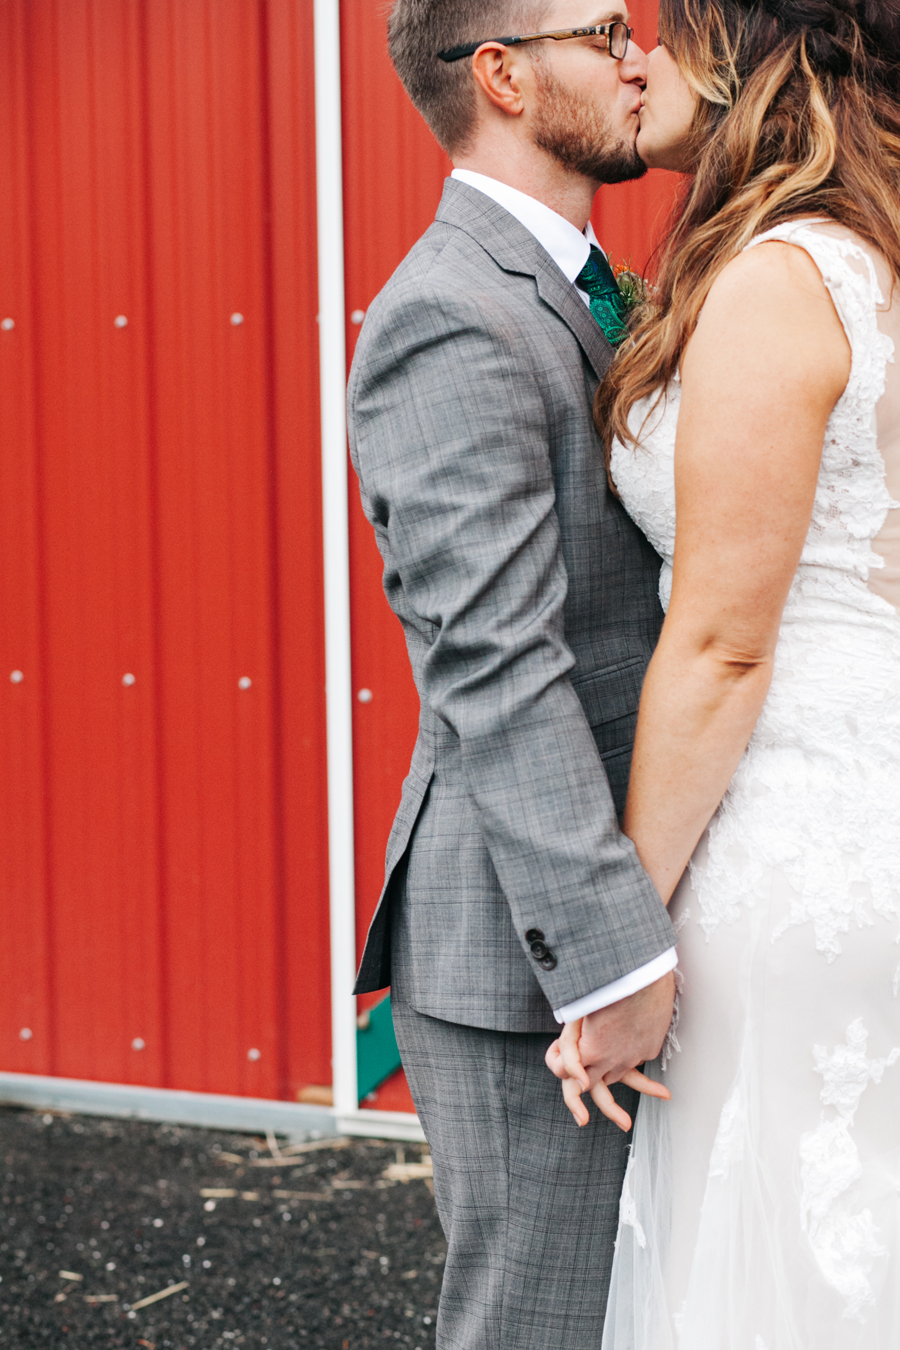 040-bellingham-wedding-photographer-katheryn-moran-photography-farm-kitchen.jpg